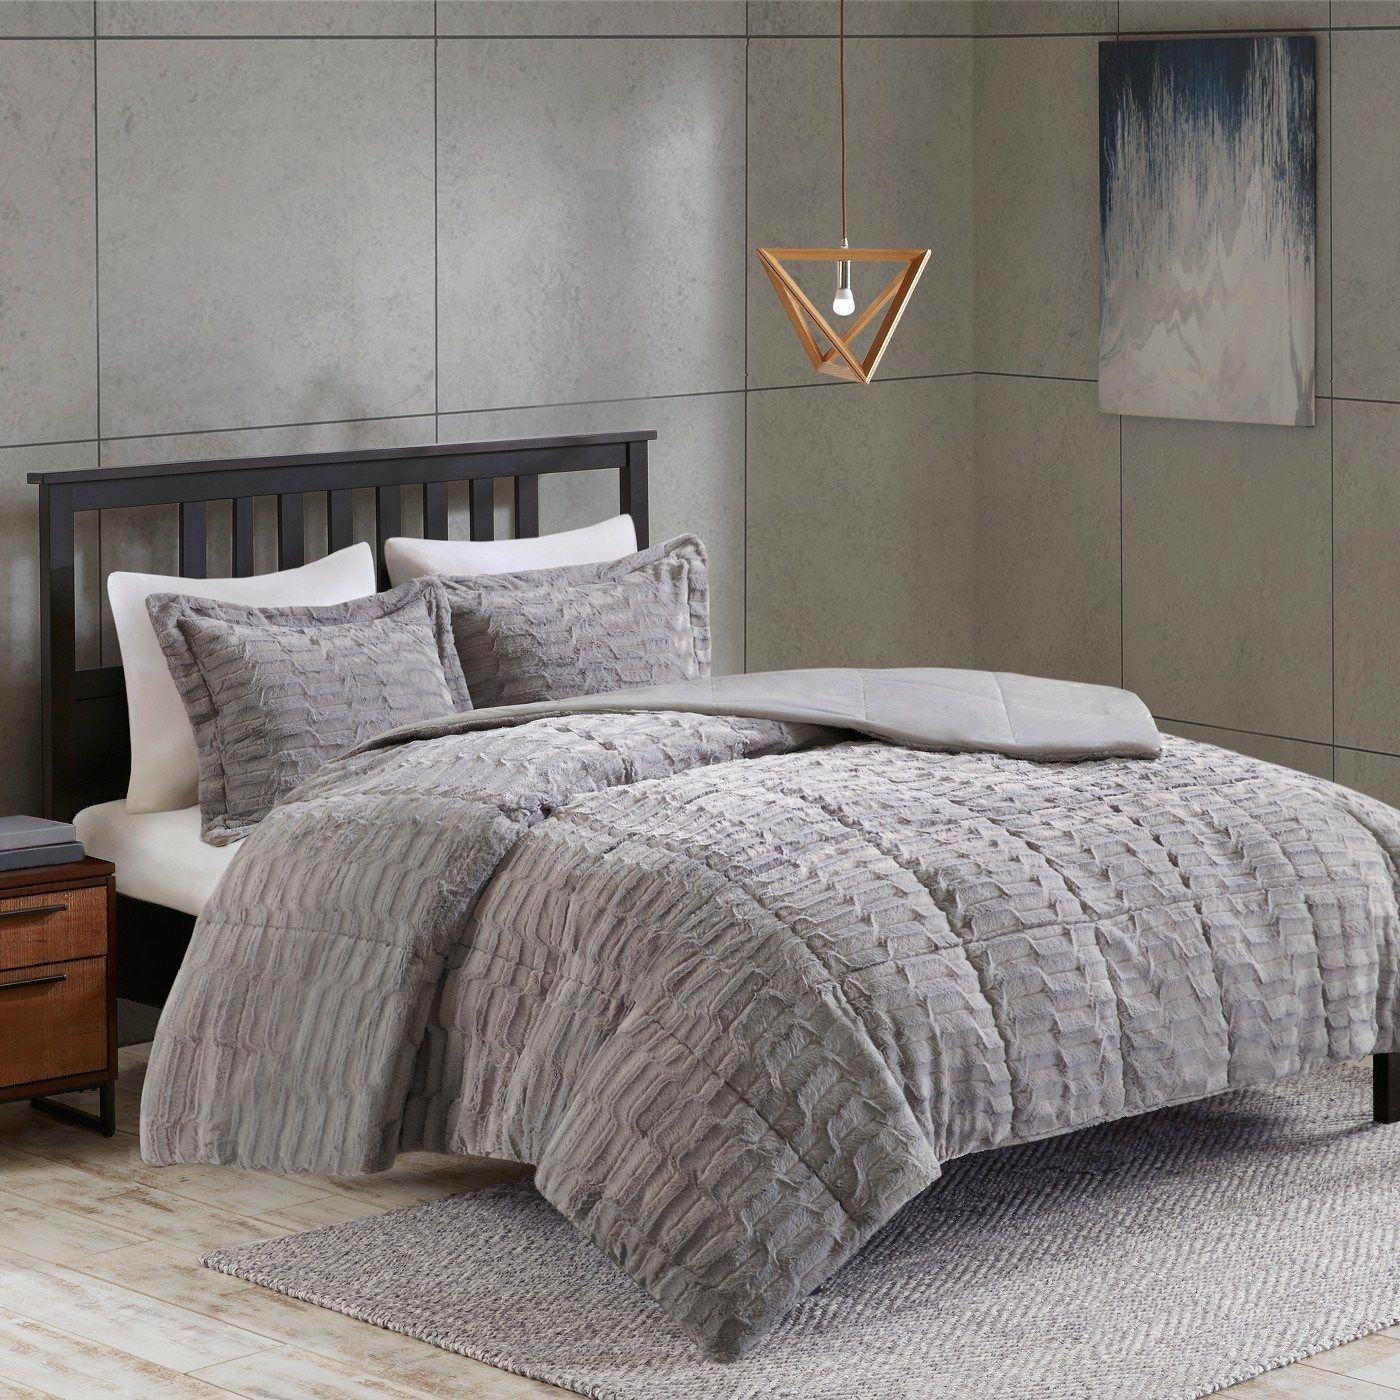 Where To Buy Bedding Sets Online Grey Comforter Sets Comforter